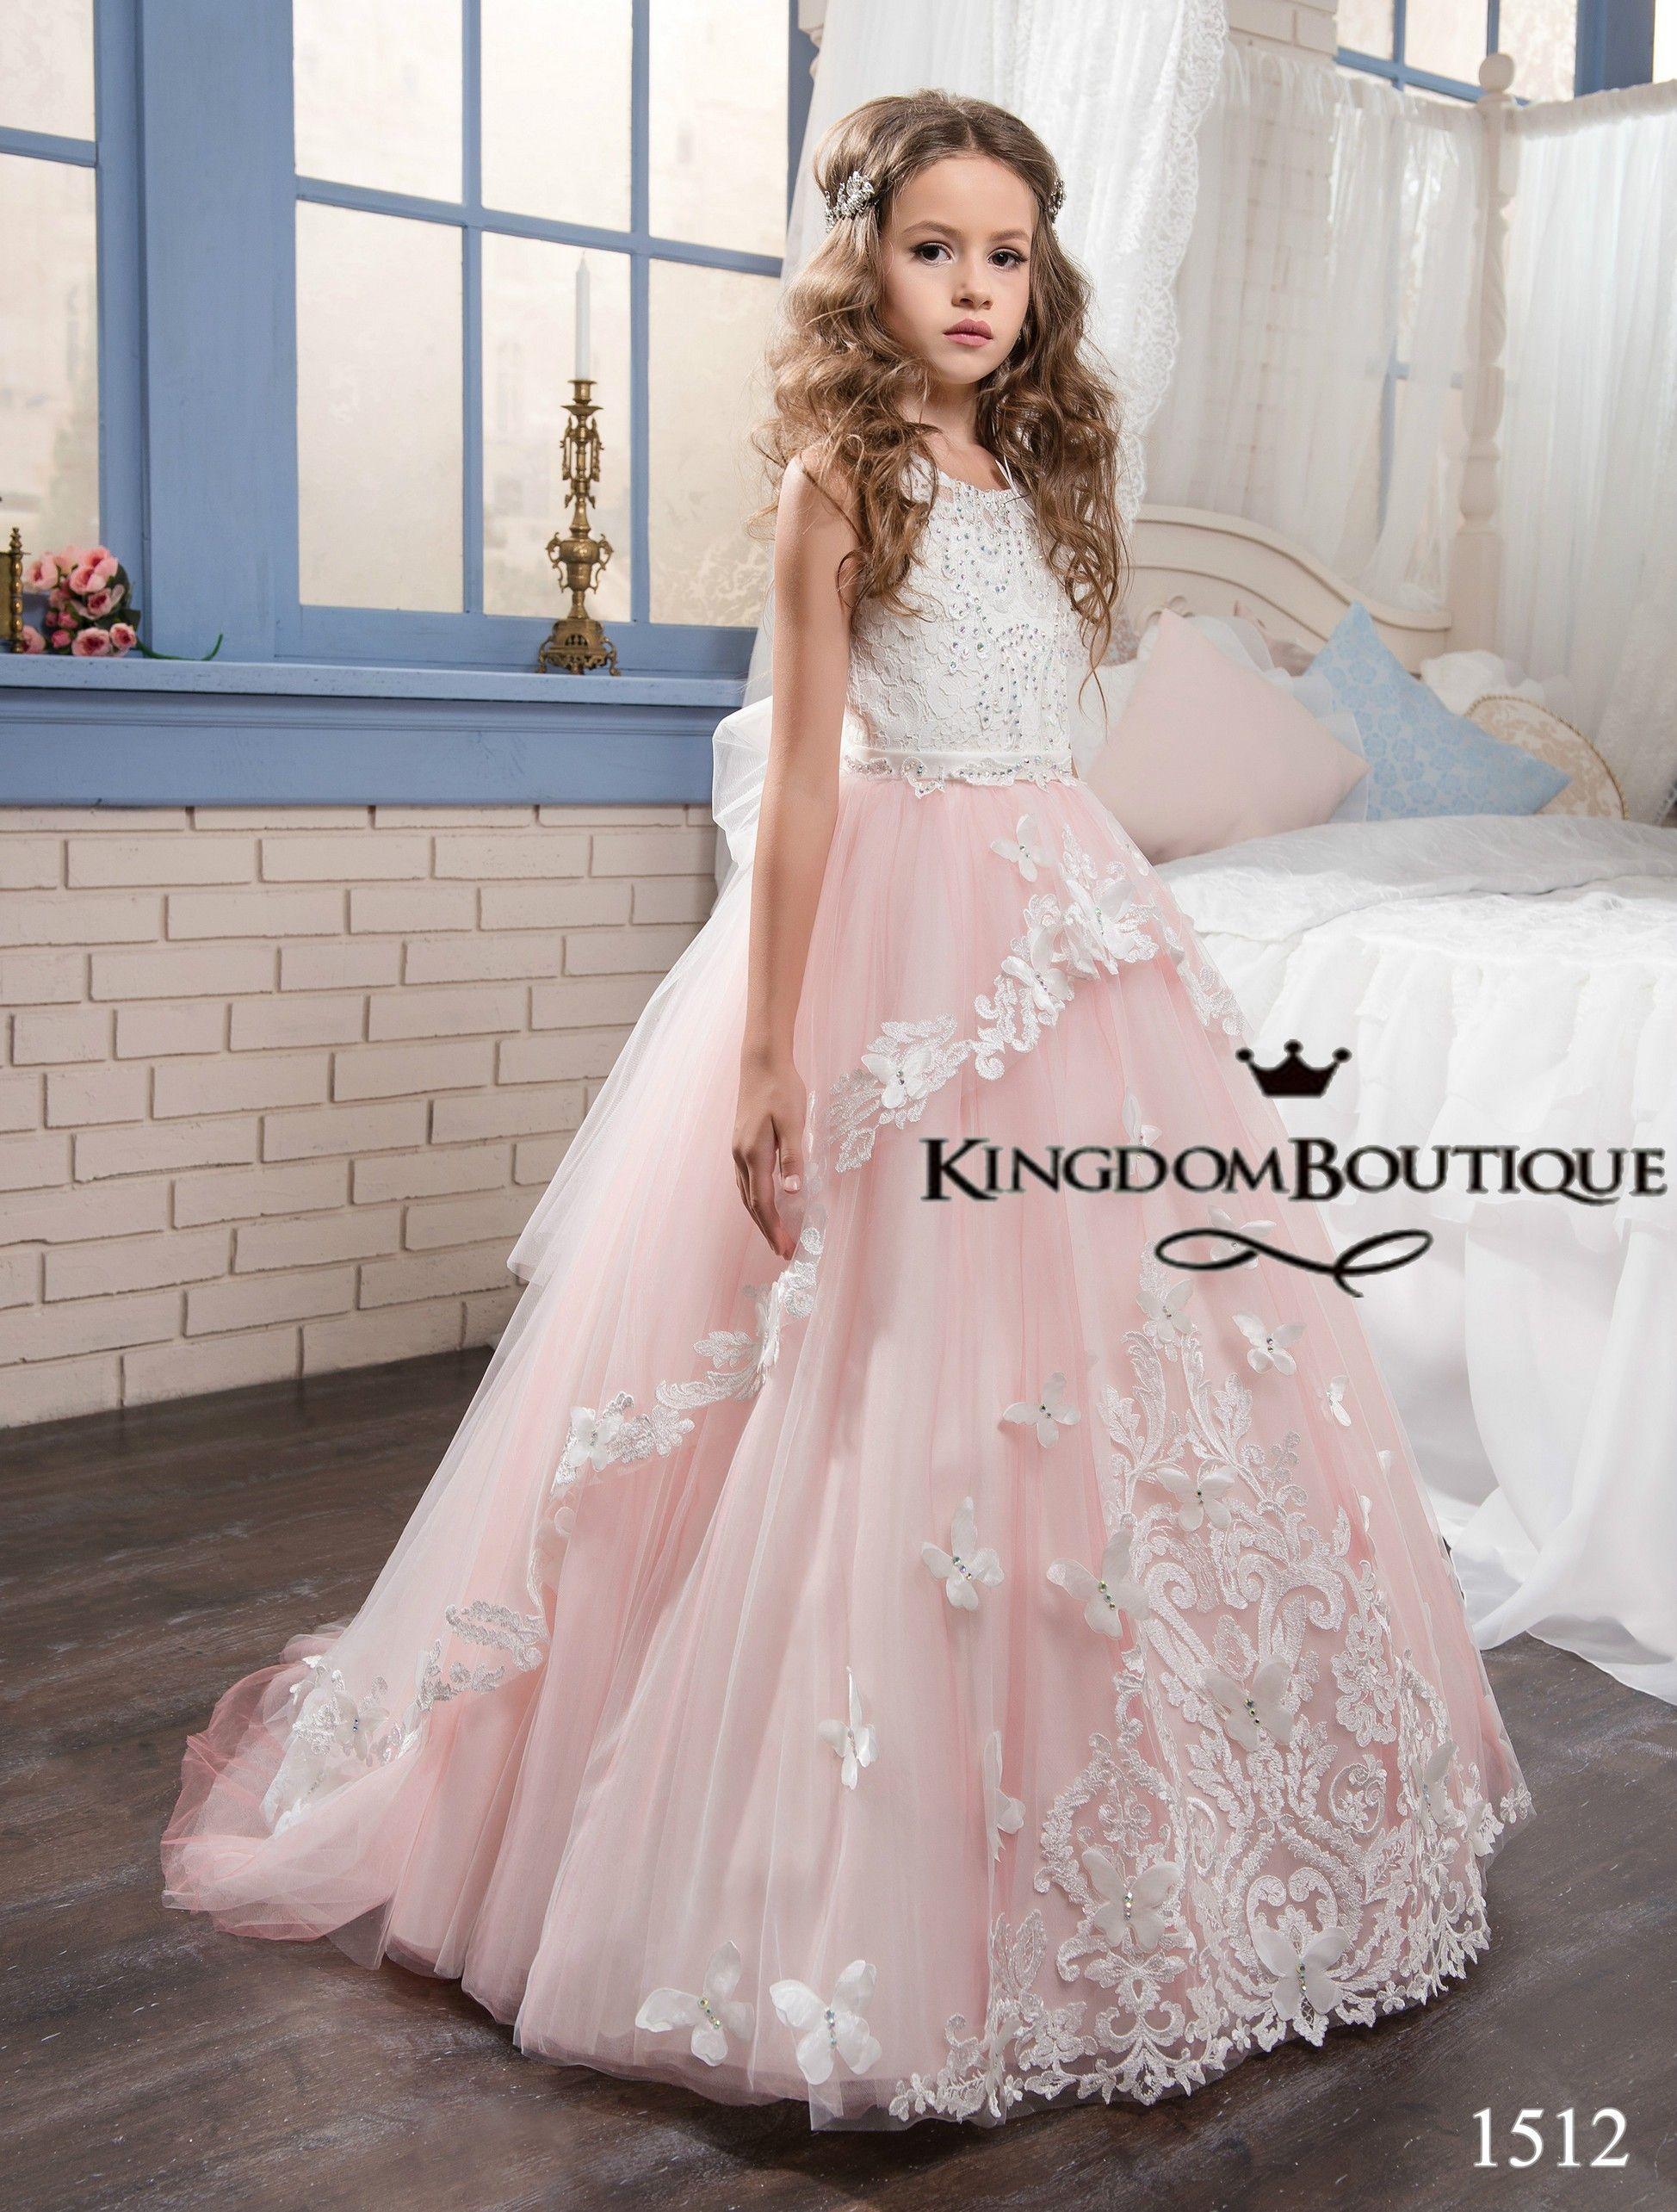 Sleeping beauty dress kingdomutique flowergirl